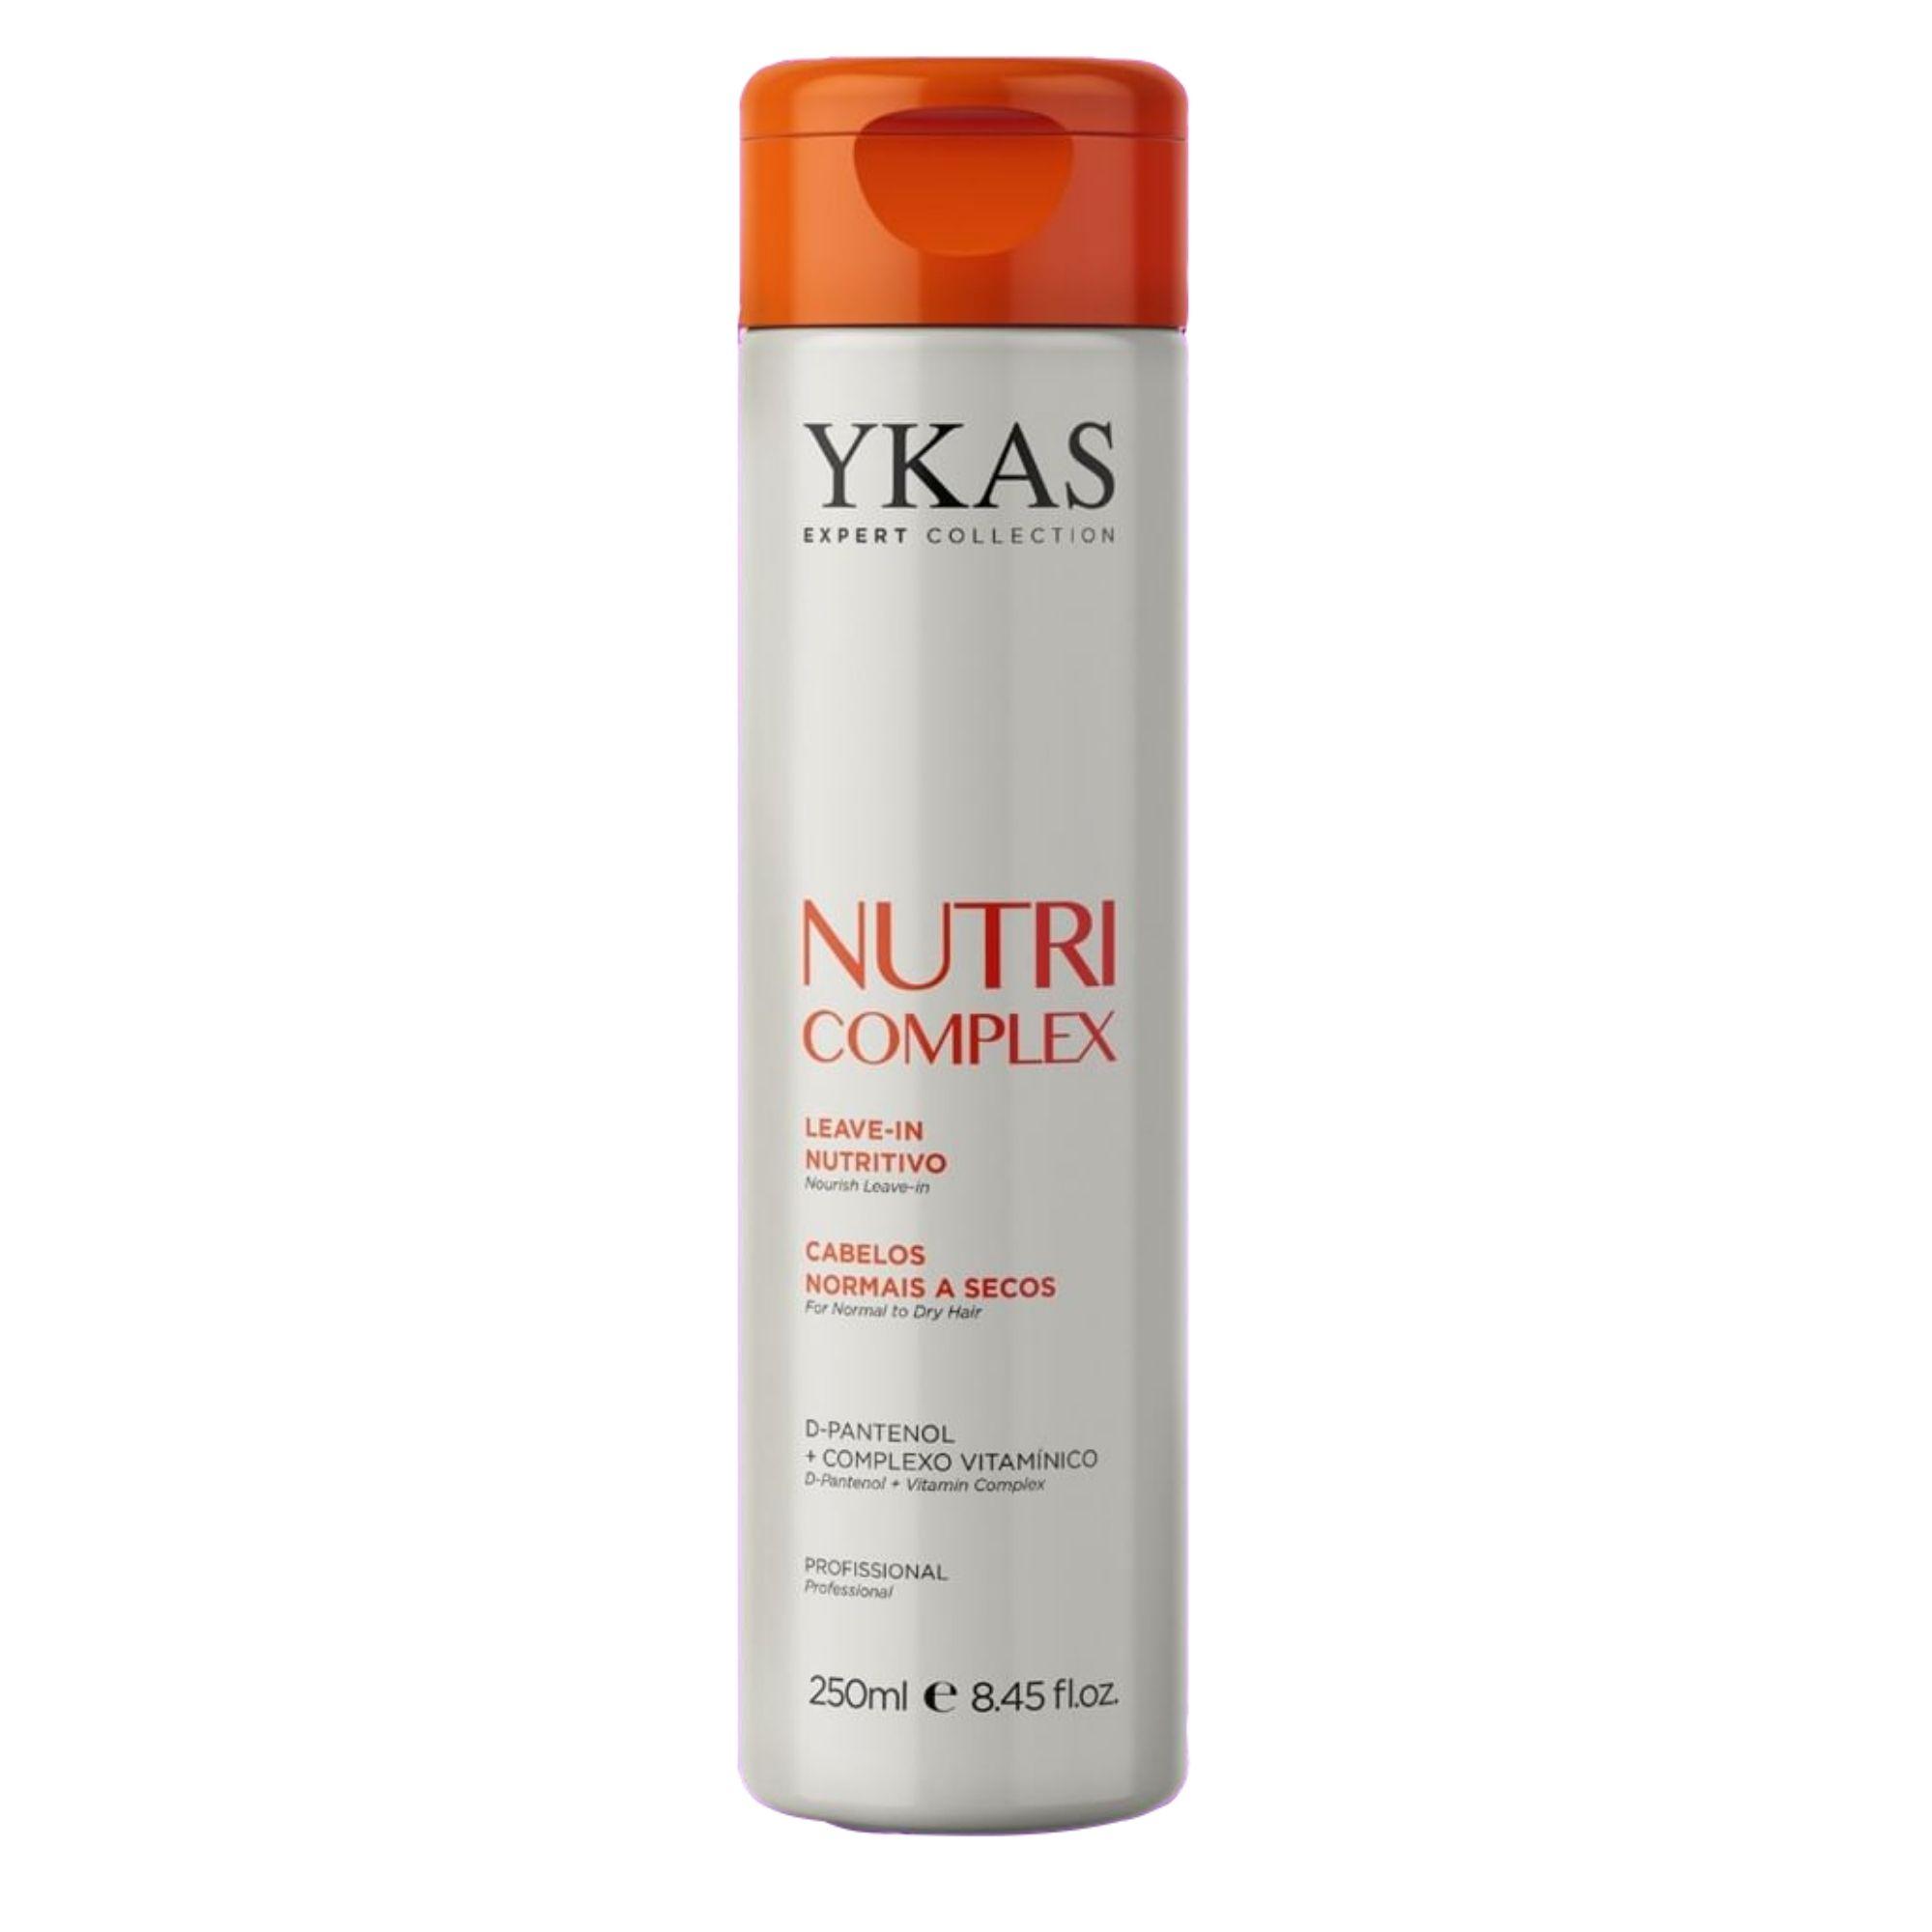 Ykas - Nutri Complex Leave-in 250ml